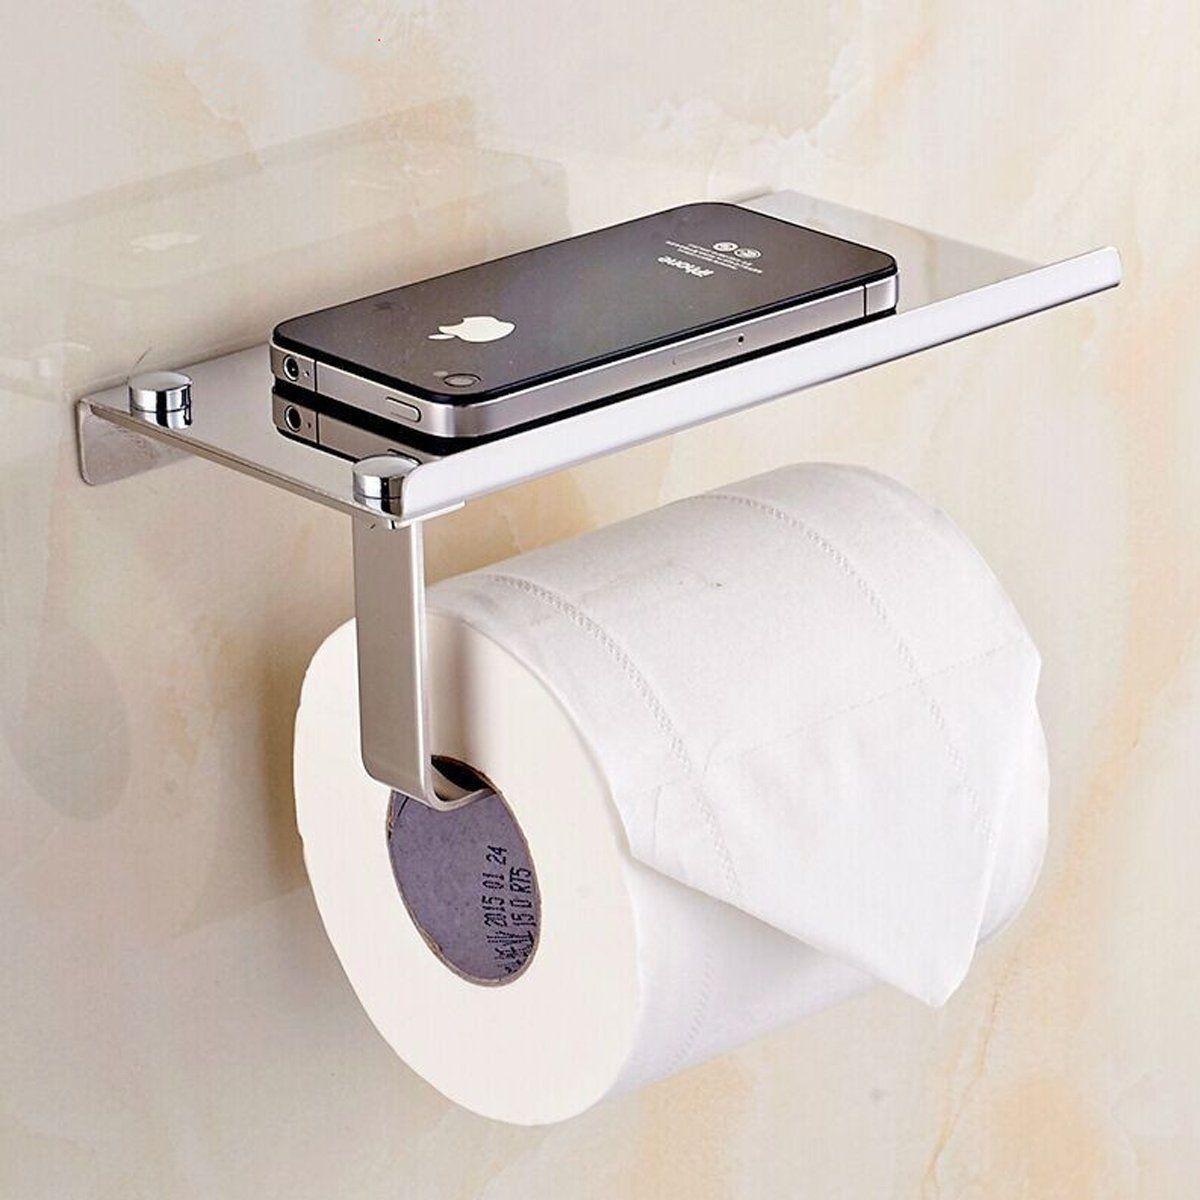 Amazon Com Bosszi Wall Mount Toilet Paper Holder Sus304 Stainless Steel Bathroom Tissue Holder Toilet Paper Holder Wall Mounted Toilet Bathroom Tissue Holder